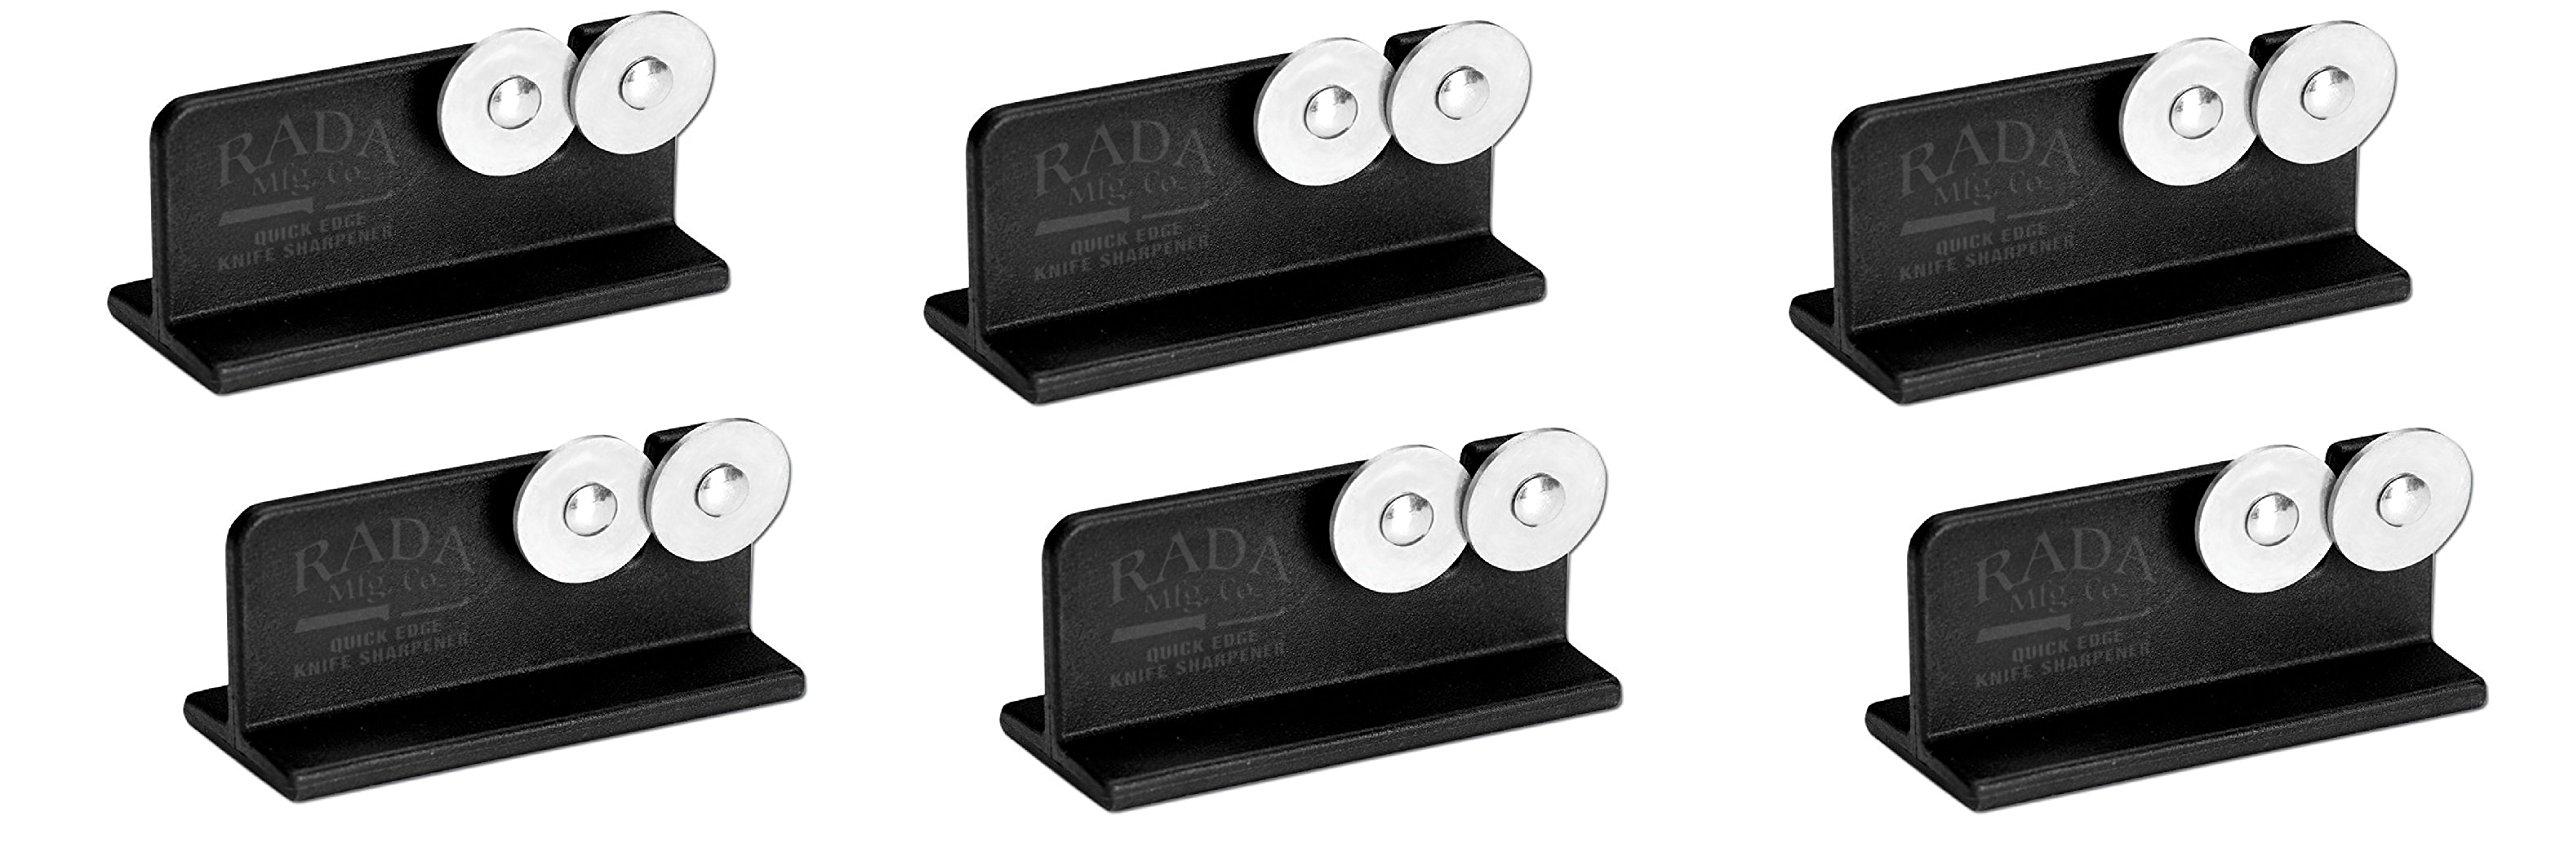 Rada Cutlery Quick Edge Knife Sharpener with Hardened Steel Wheels (Pack of 6 - R119/6) by Rada Cutlery